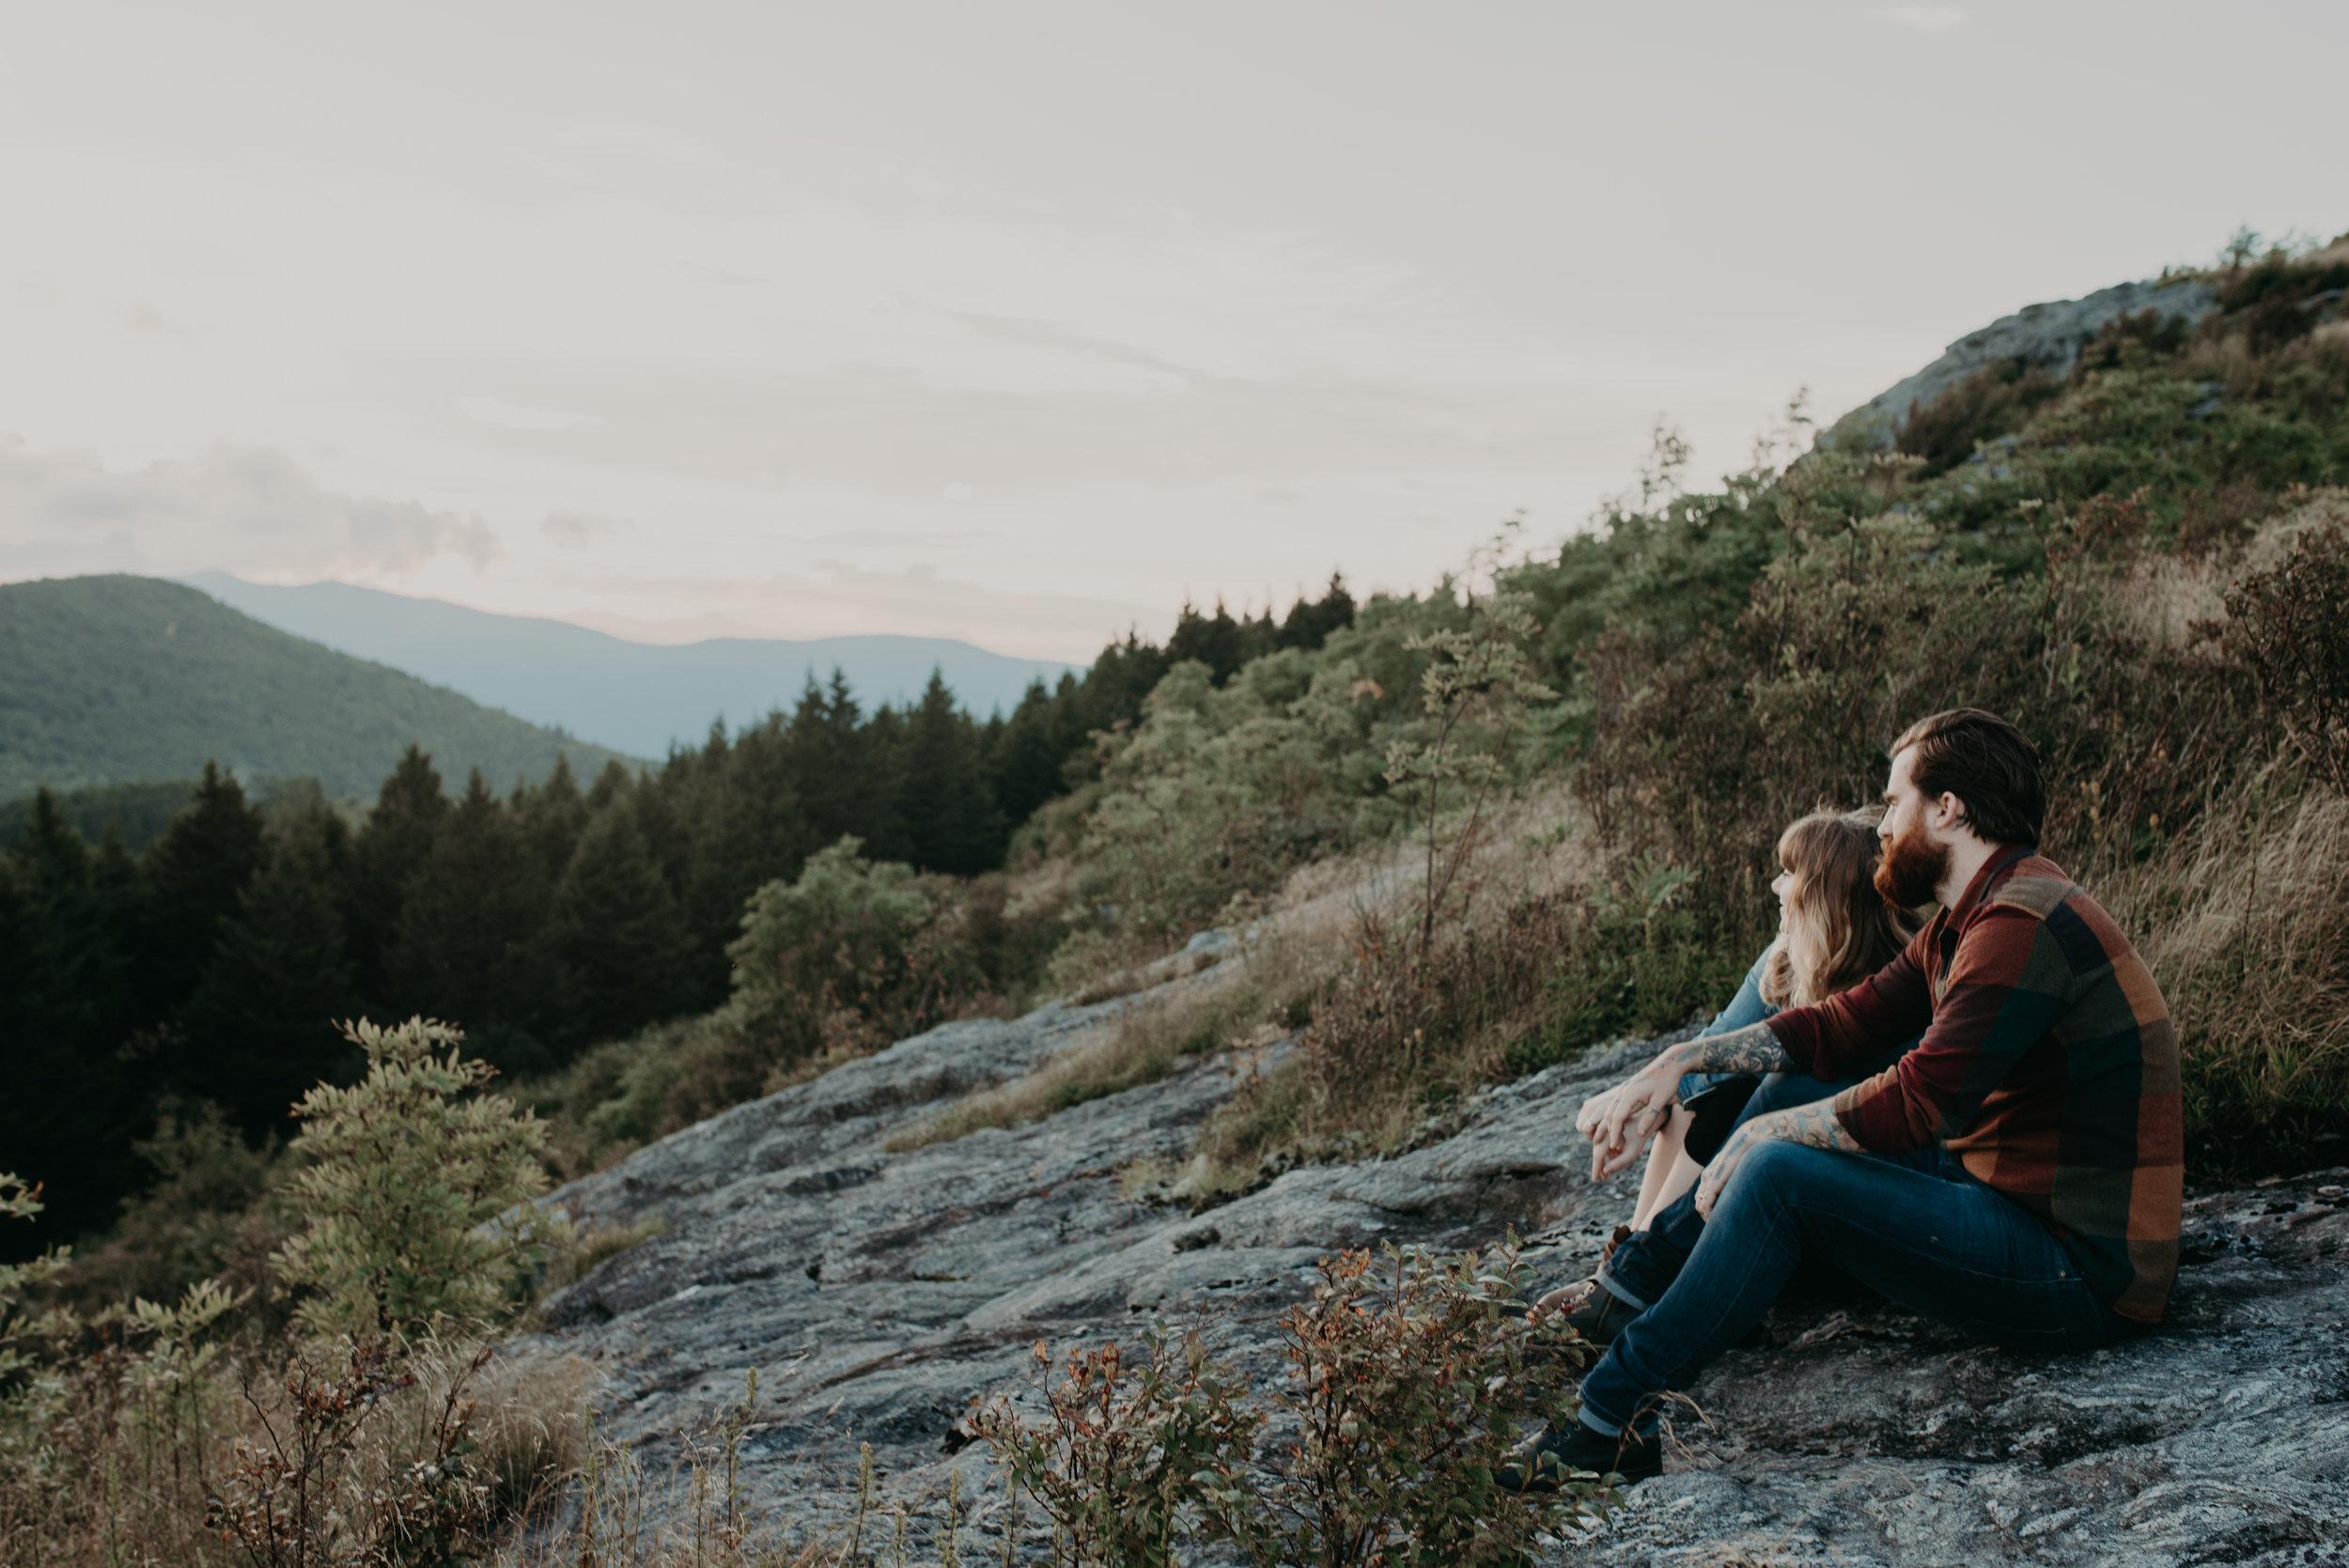 leah-joe-middleton-asheville-north-carolina-couple-session-destination-elopement-photographer-fox-and-film-147.jpg